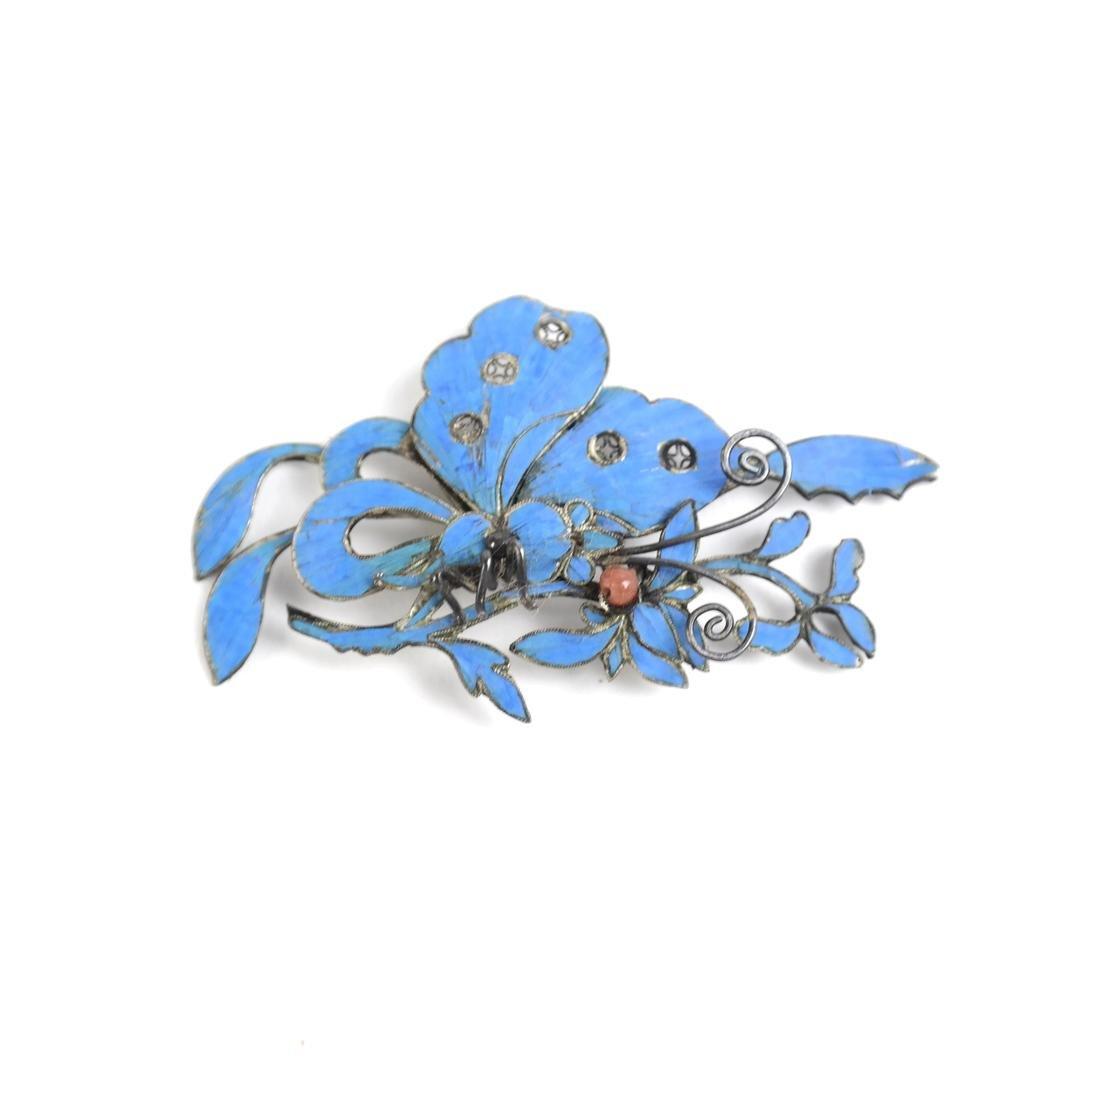 Chinese Kingfisher Hairpins - 2